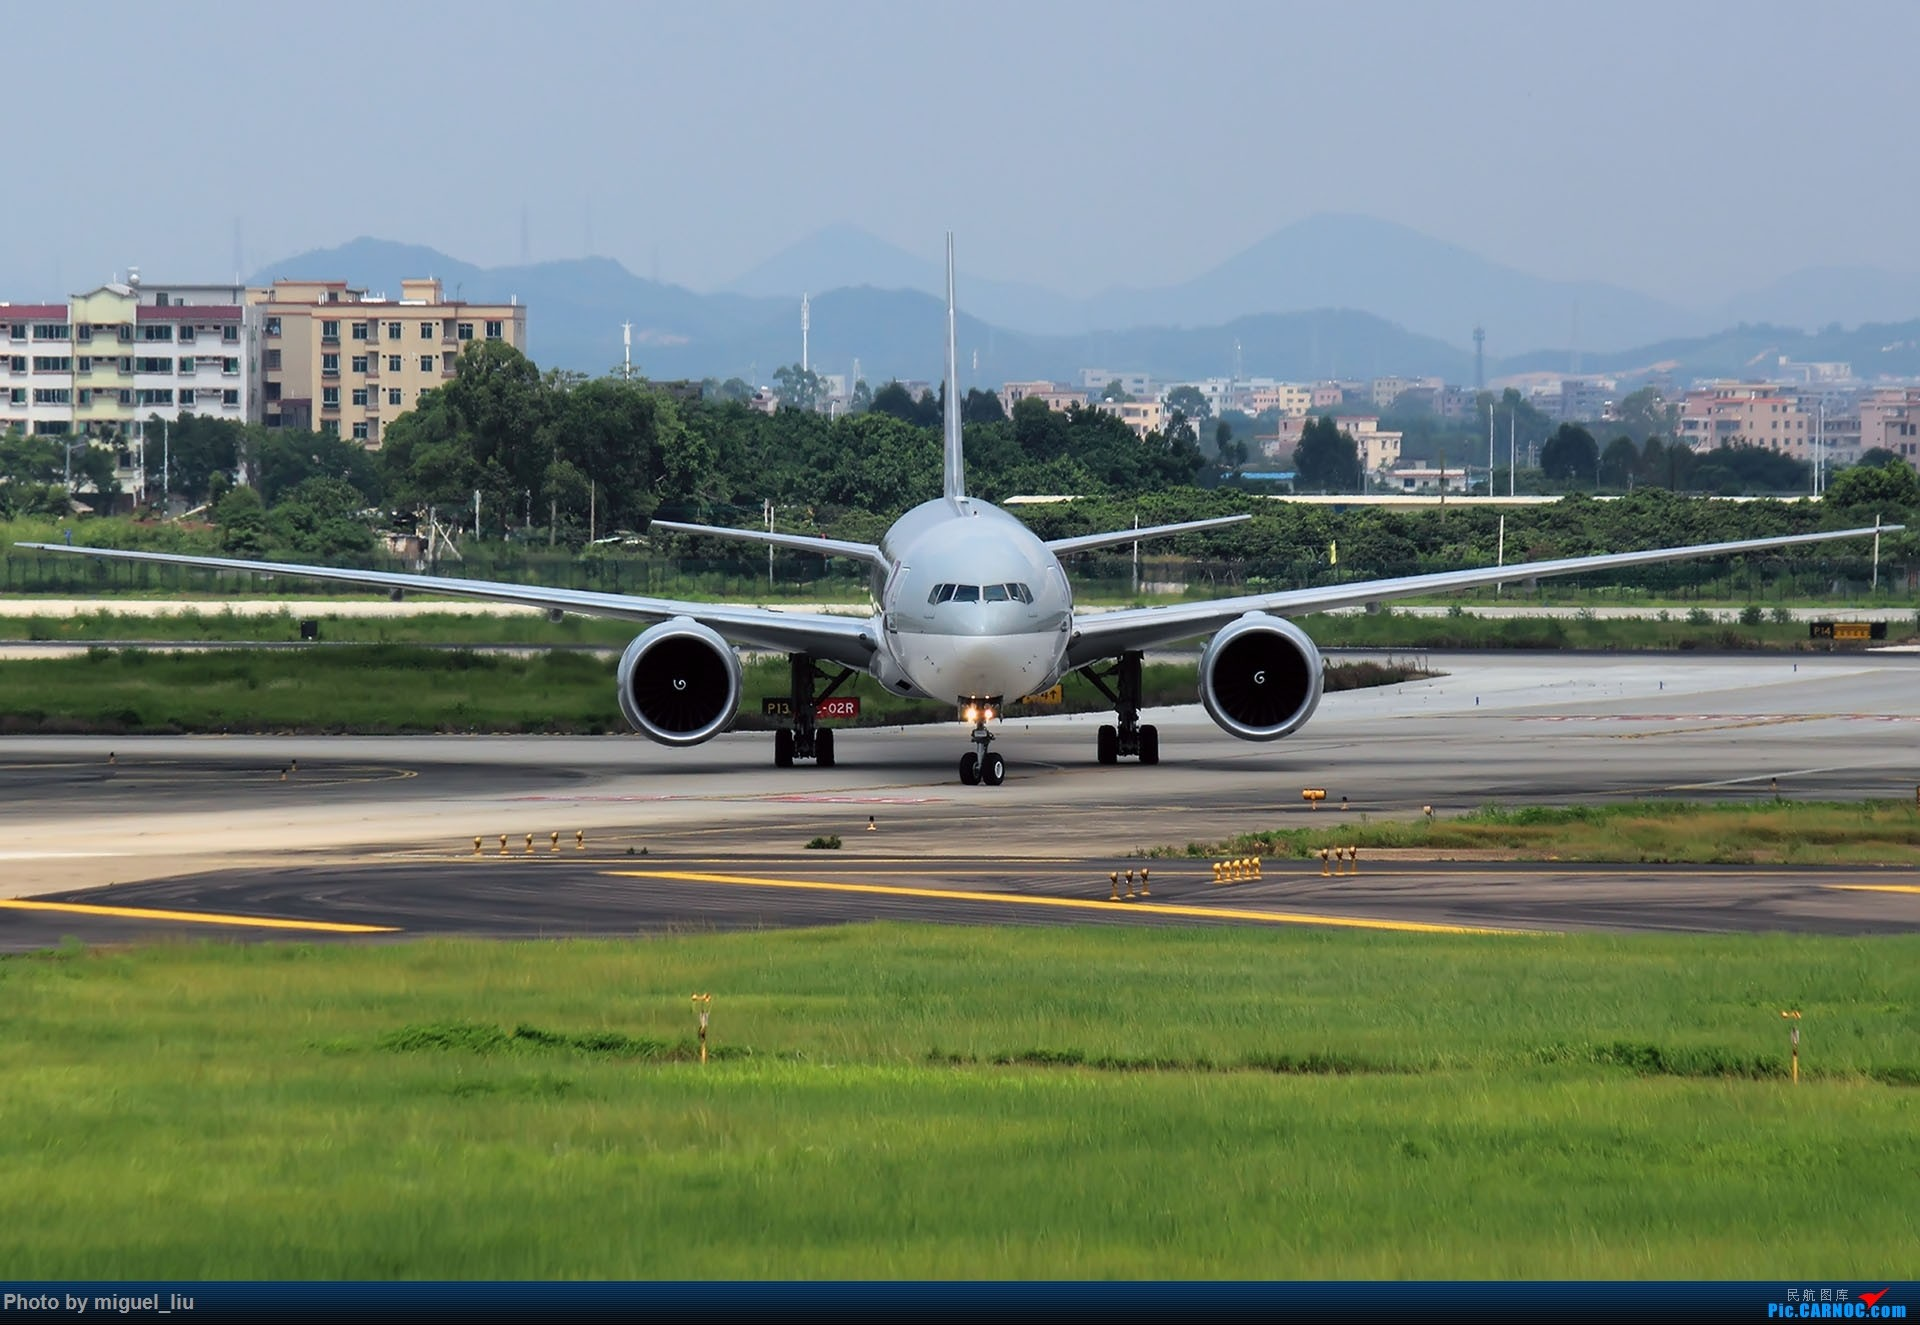 Re:[原创][*********Miguel_liu********]7月28日例行打卡 BOEING 777-300ER A7-BAL 中国广州白云国际机场